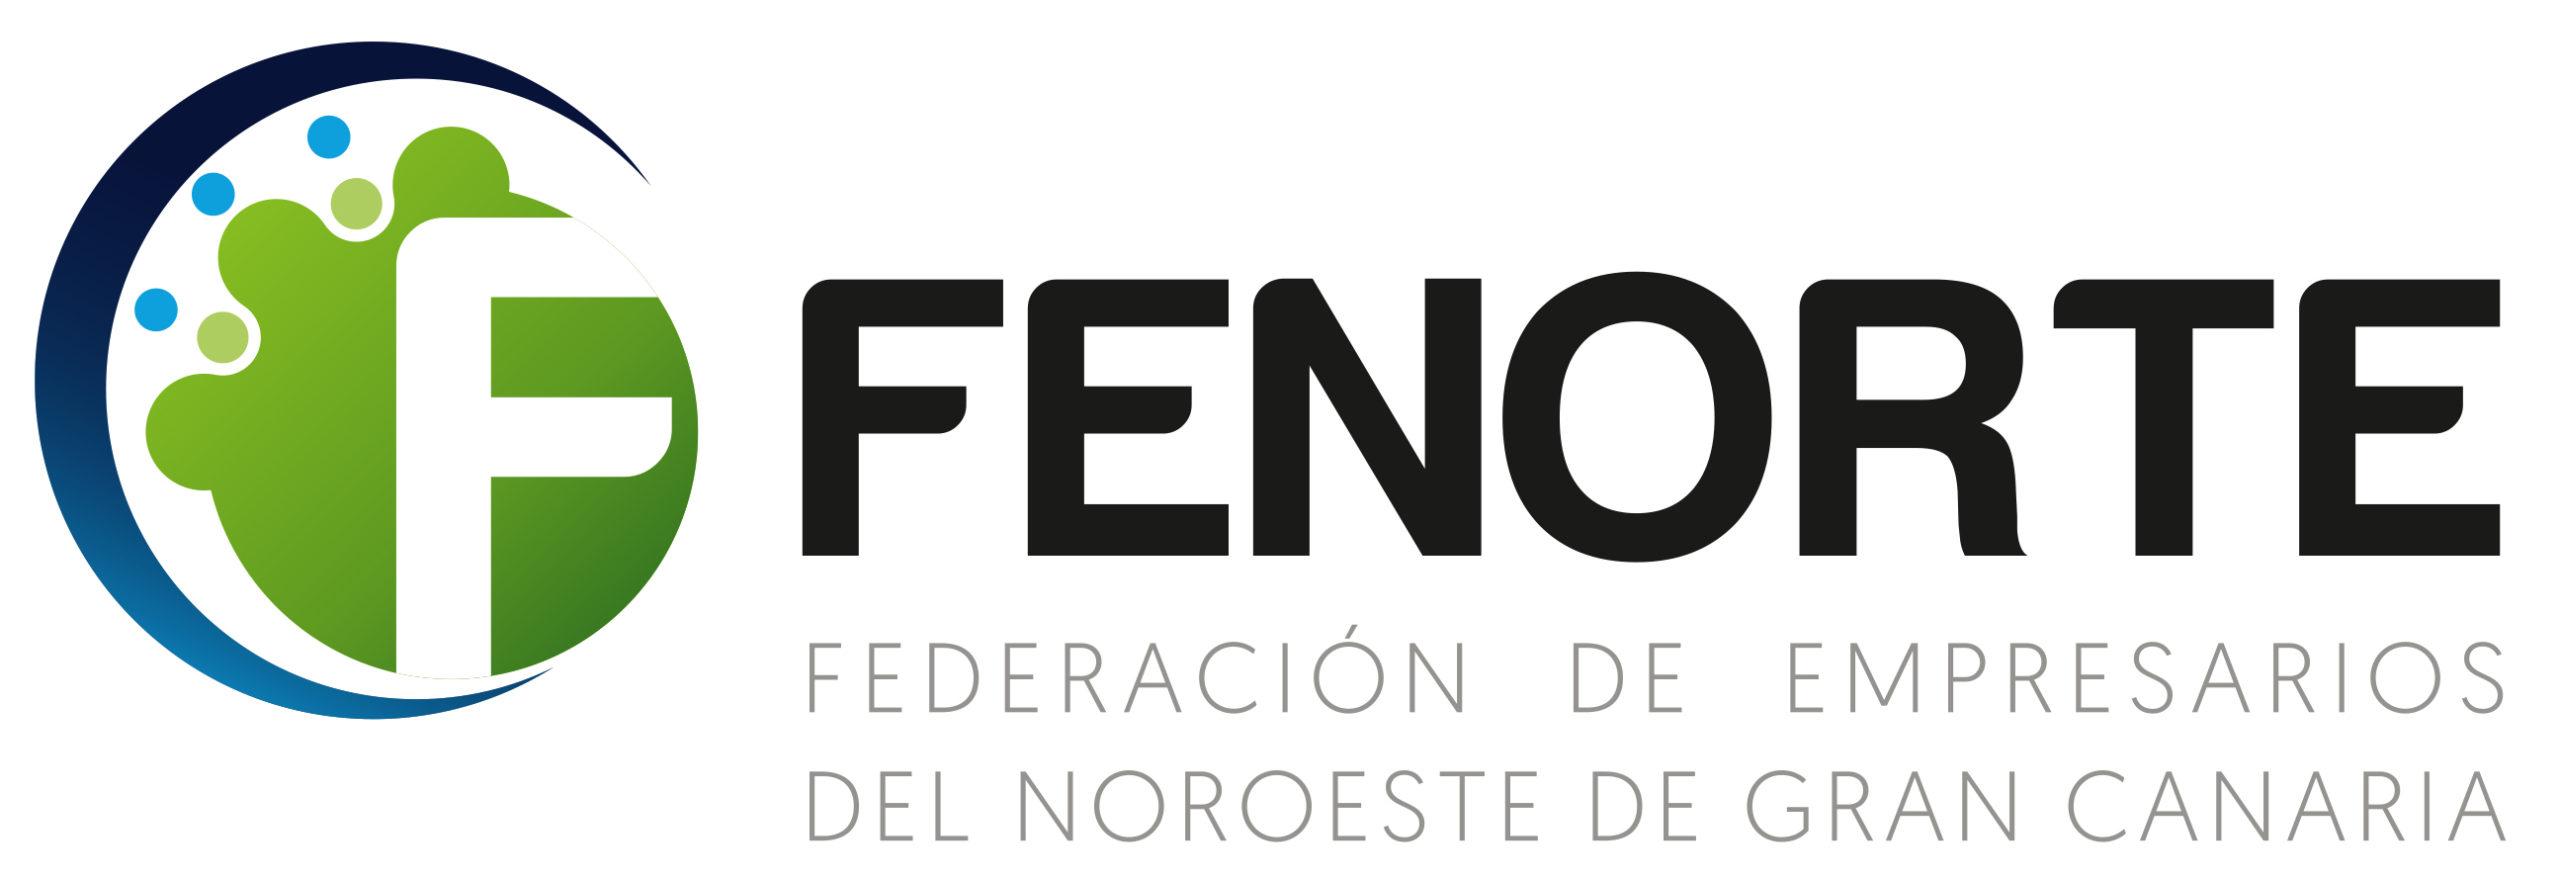 Fenorte